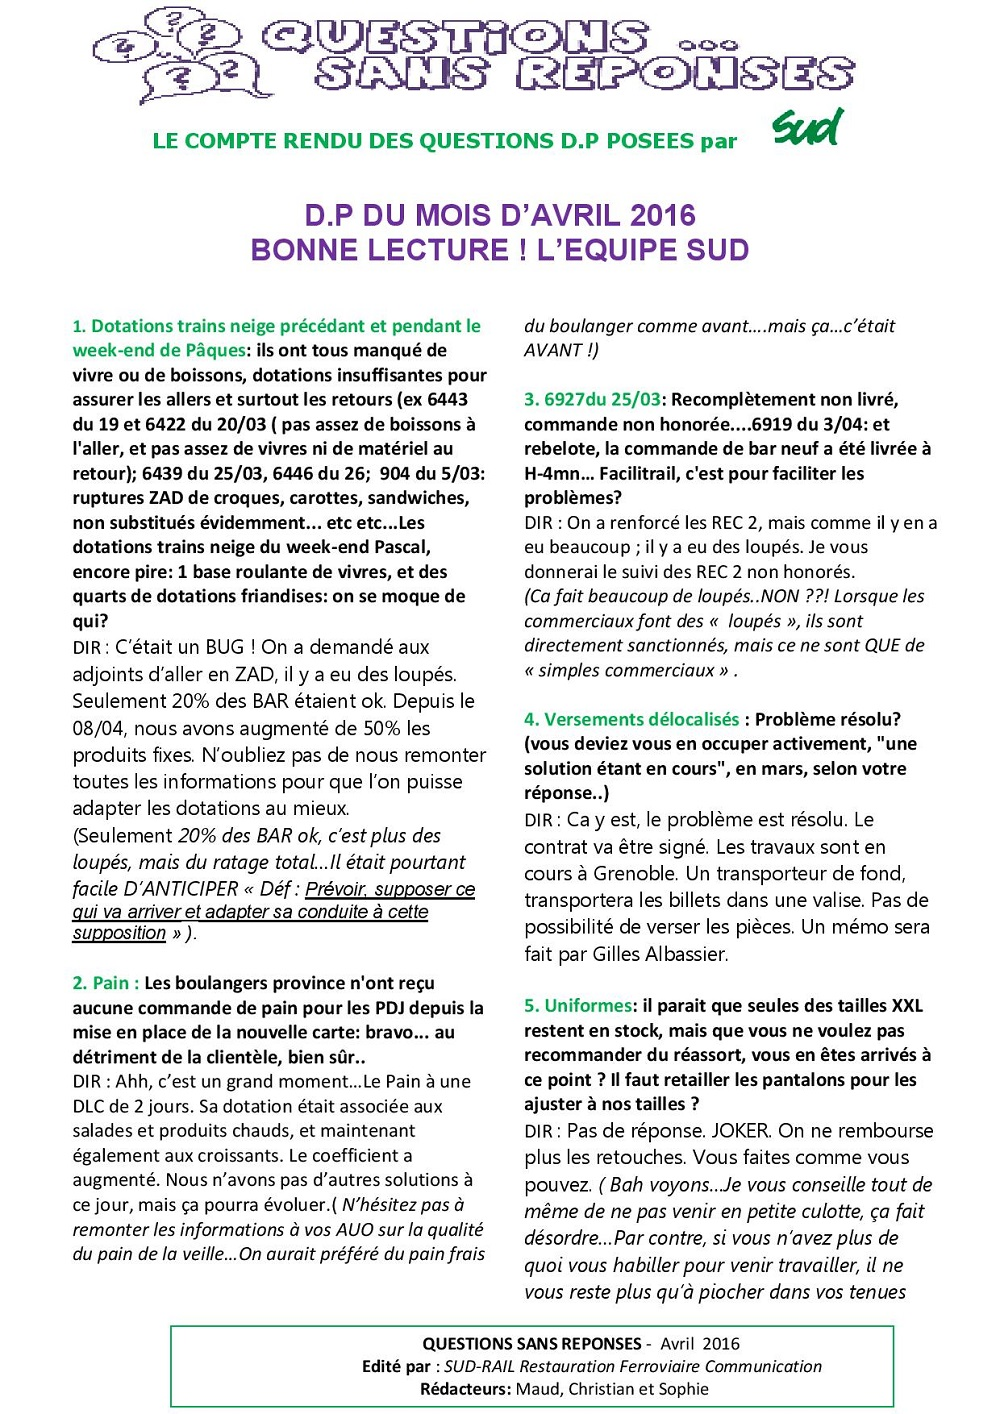 CRDP restofer 04-2016-page3